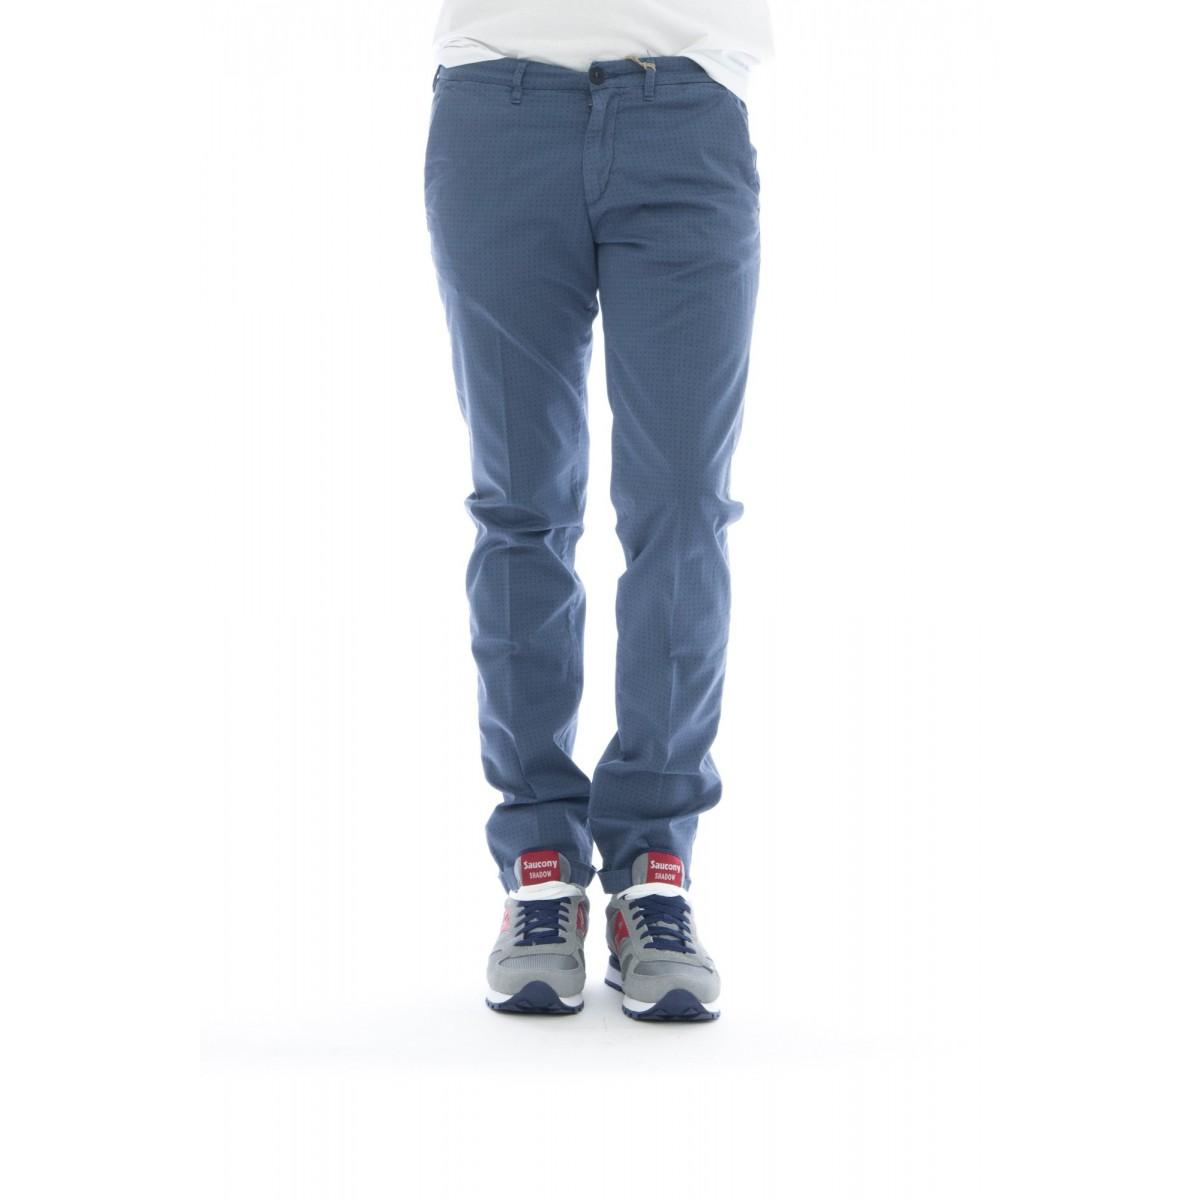 Pantalone uomo - Lenny 1117 stampa